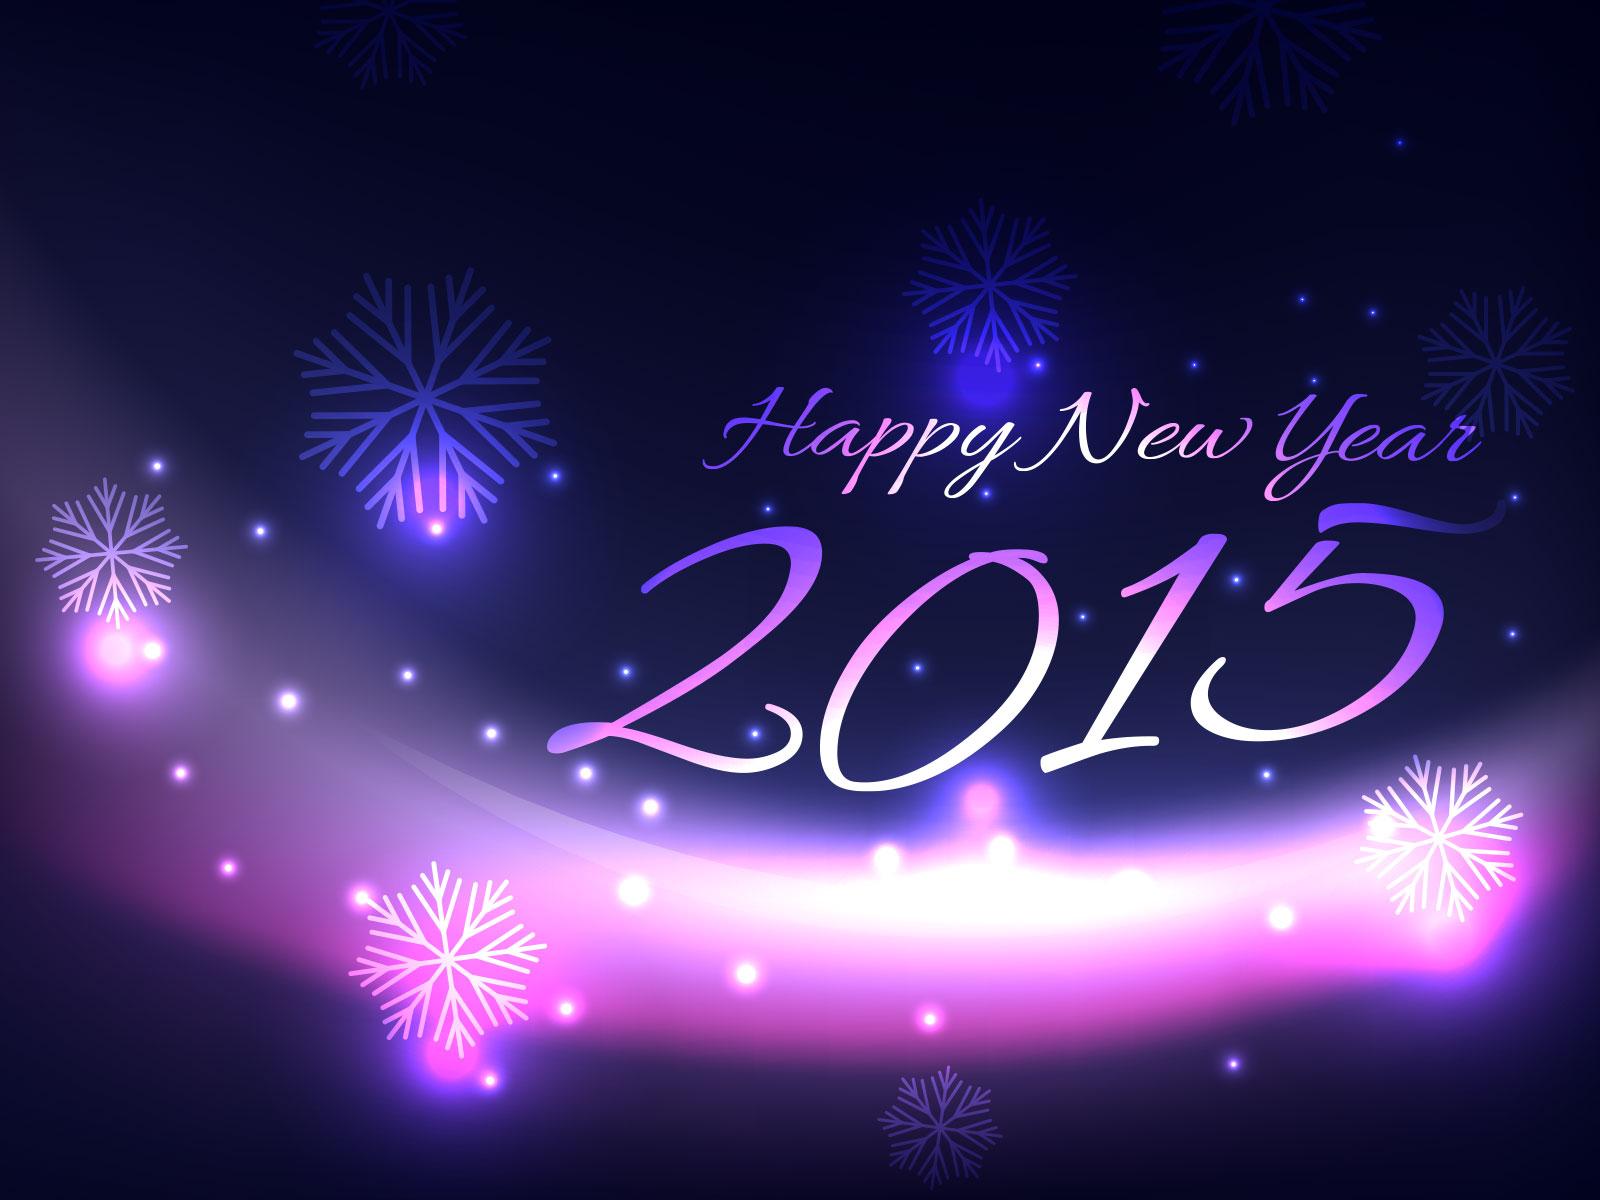 16640 new year 2015 wallpaper 1600x1200